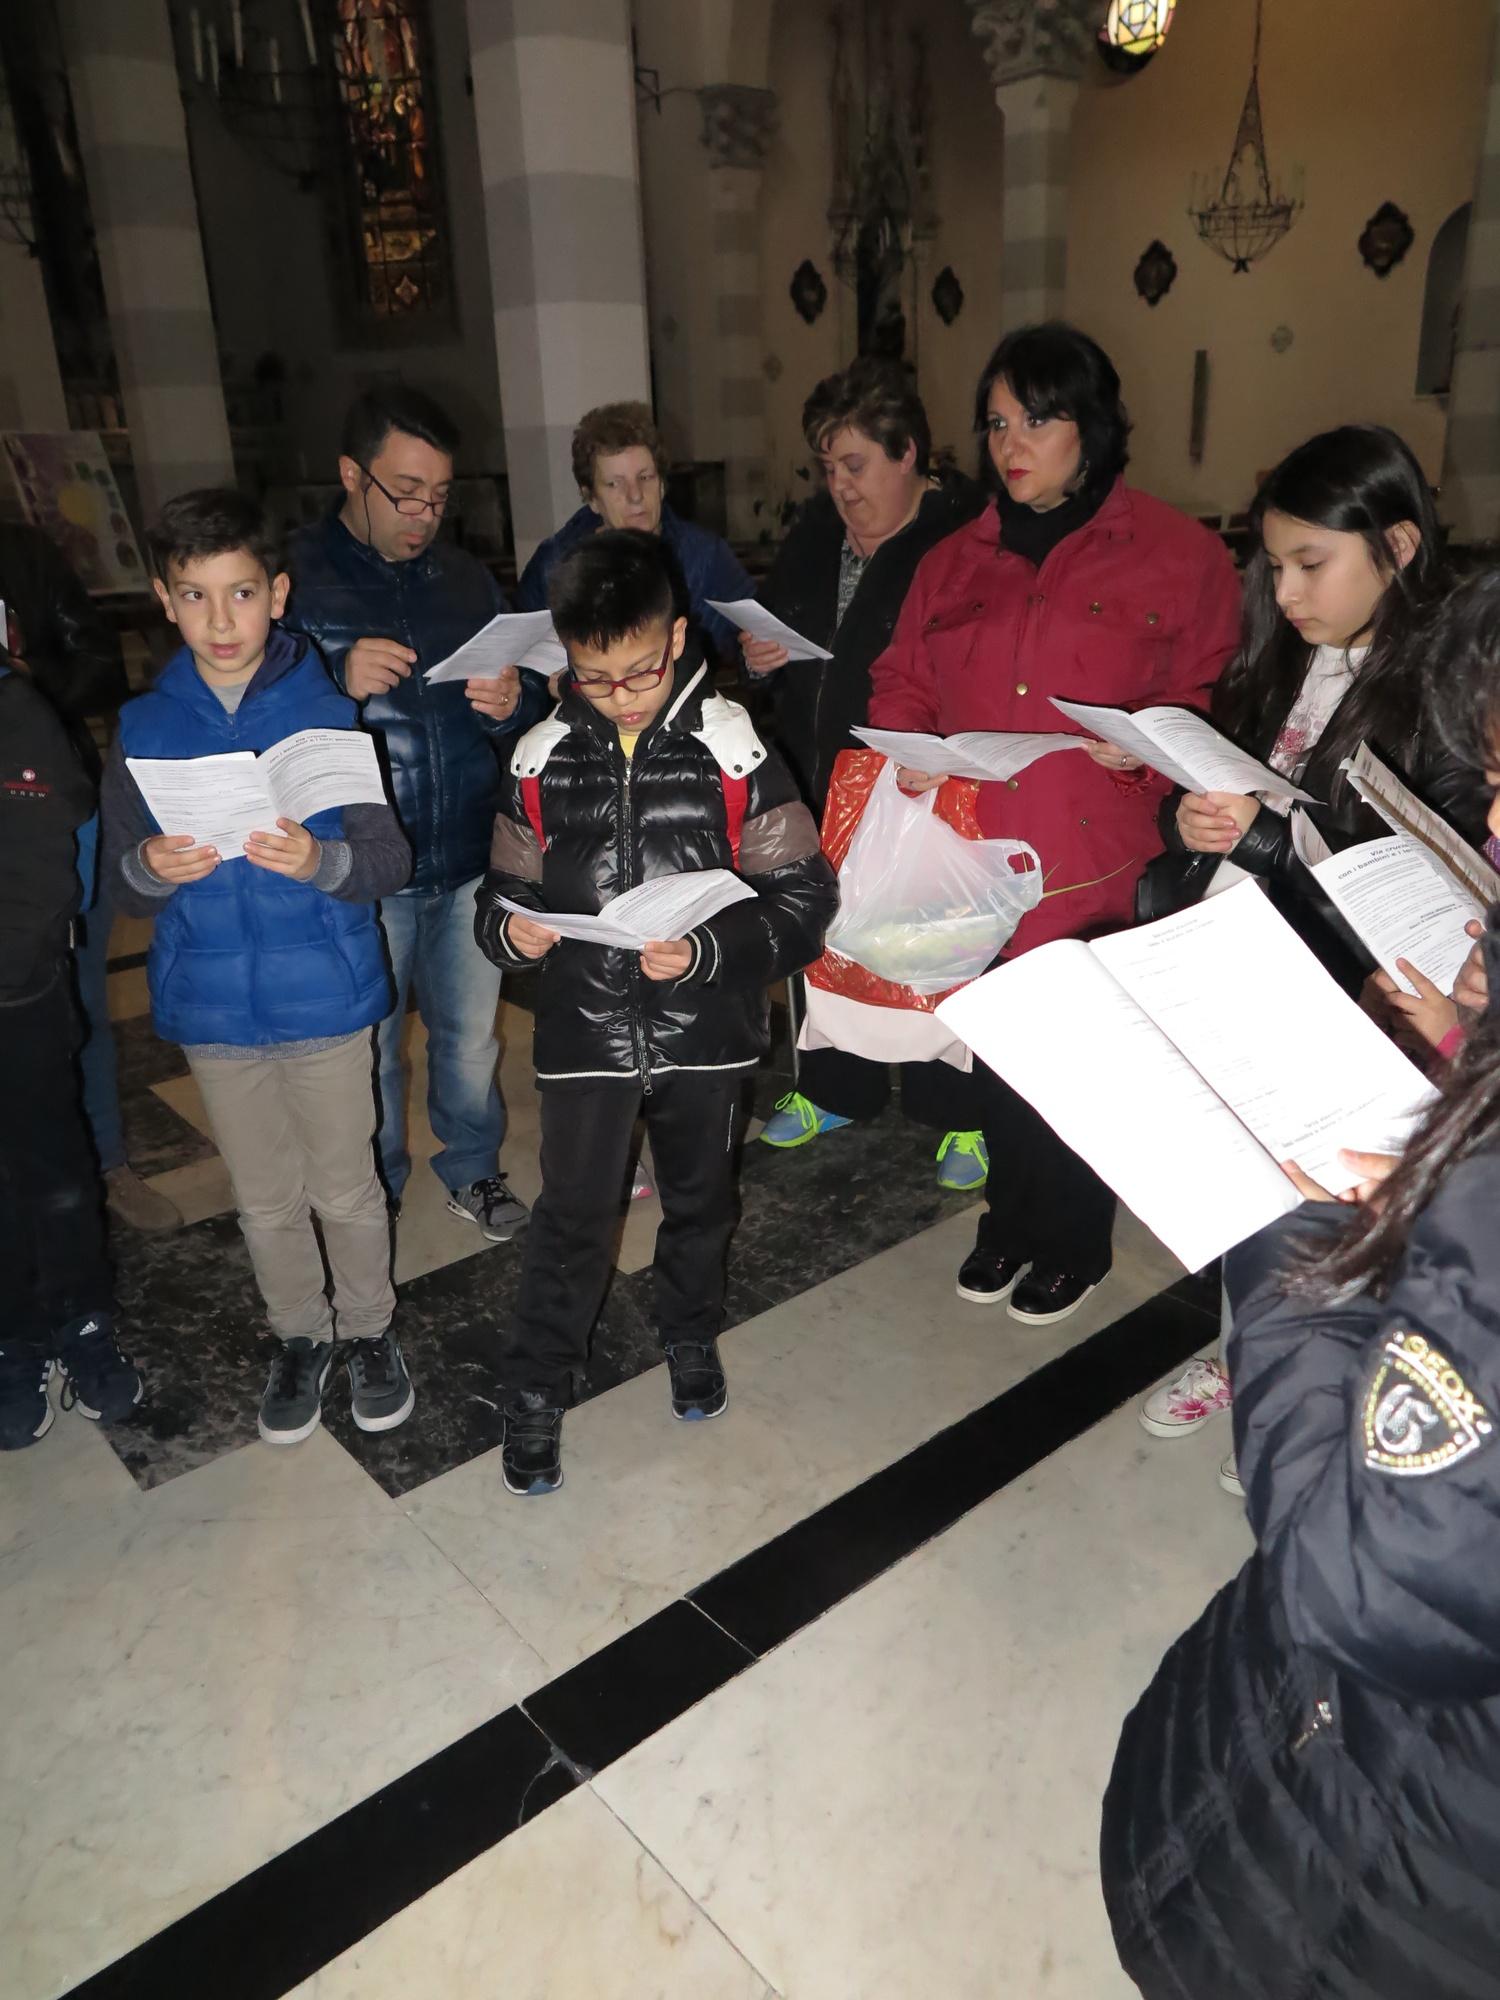 via-crucis-catechismo-2016-03-20-10-18-20